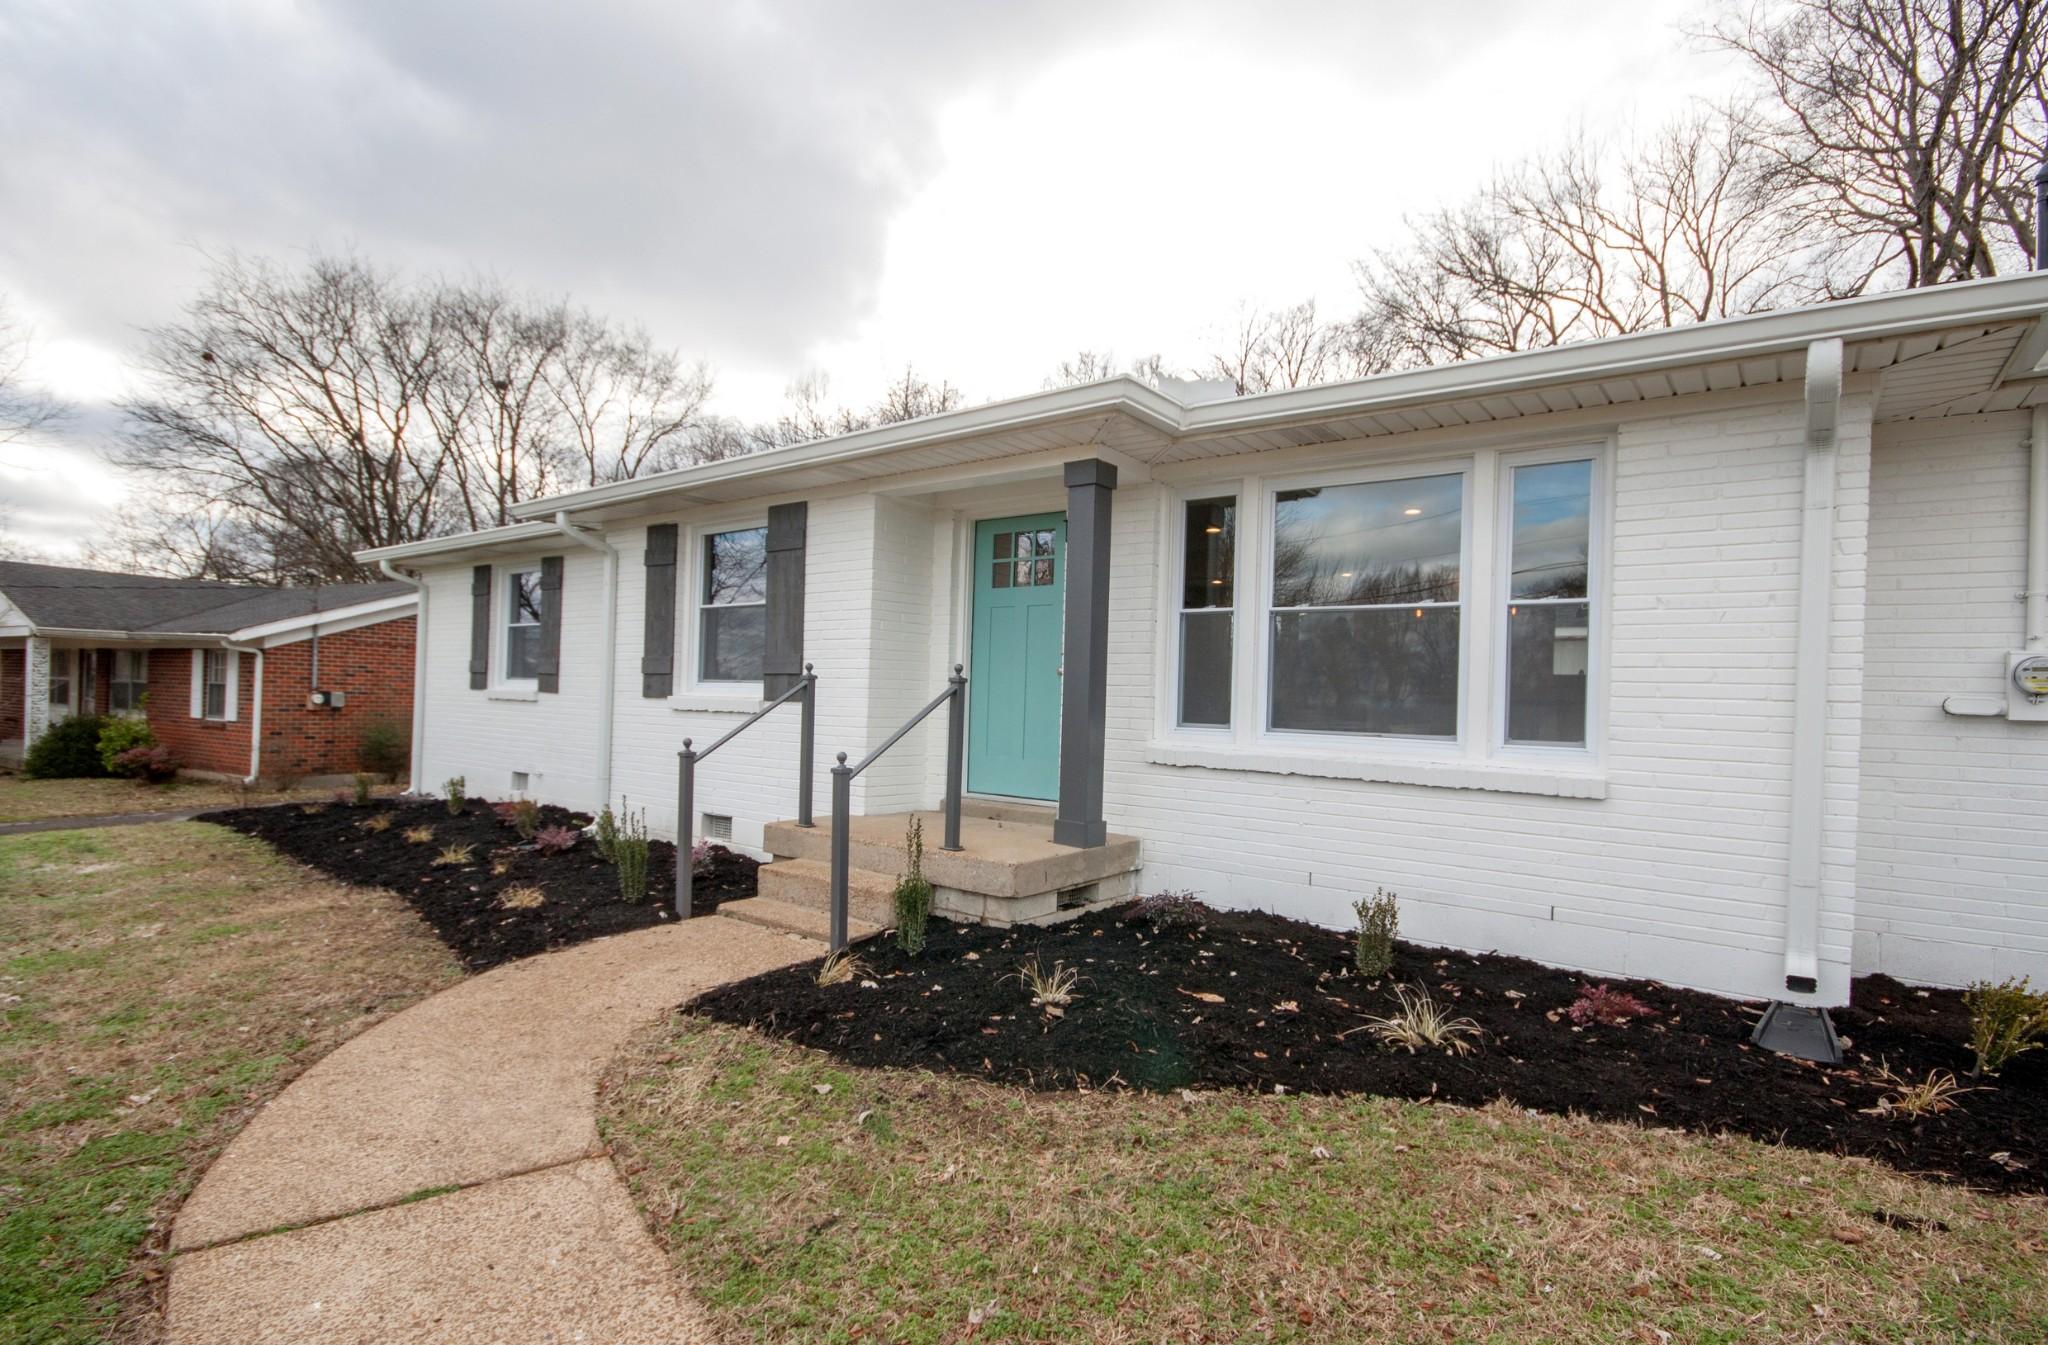 3001 Mavert Dr, Nashville, TN 37211 - Nashville, TN real estate listing